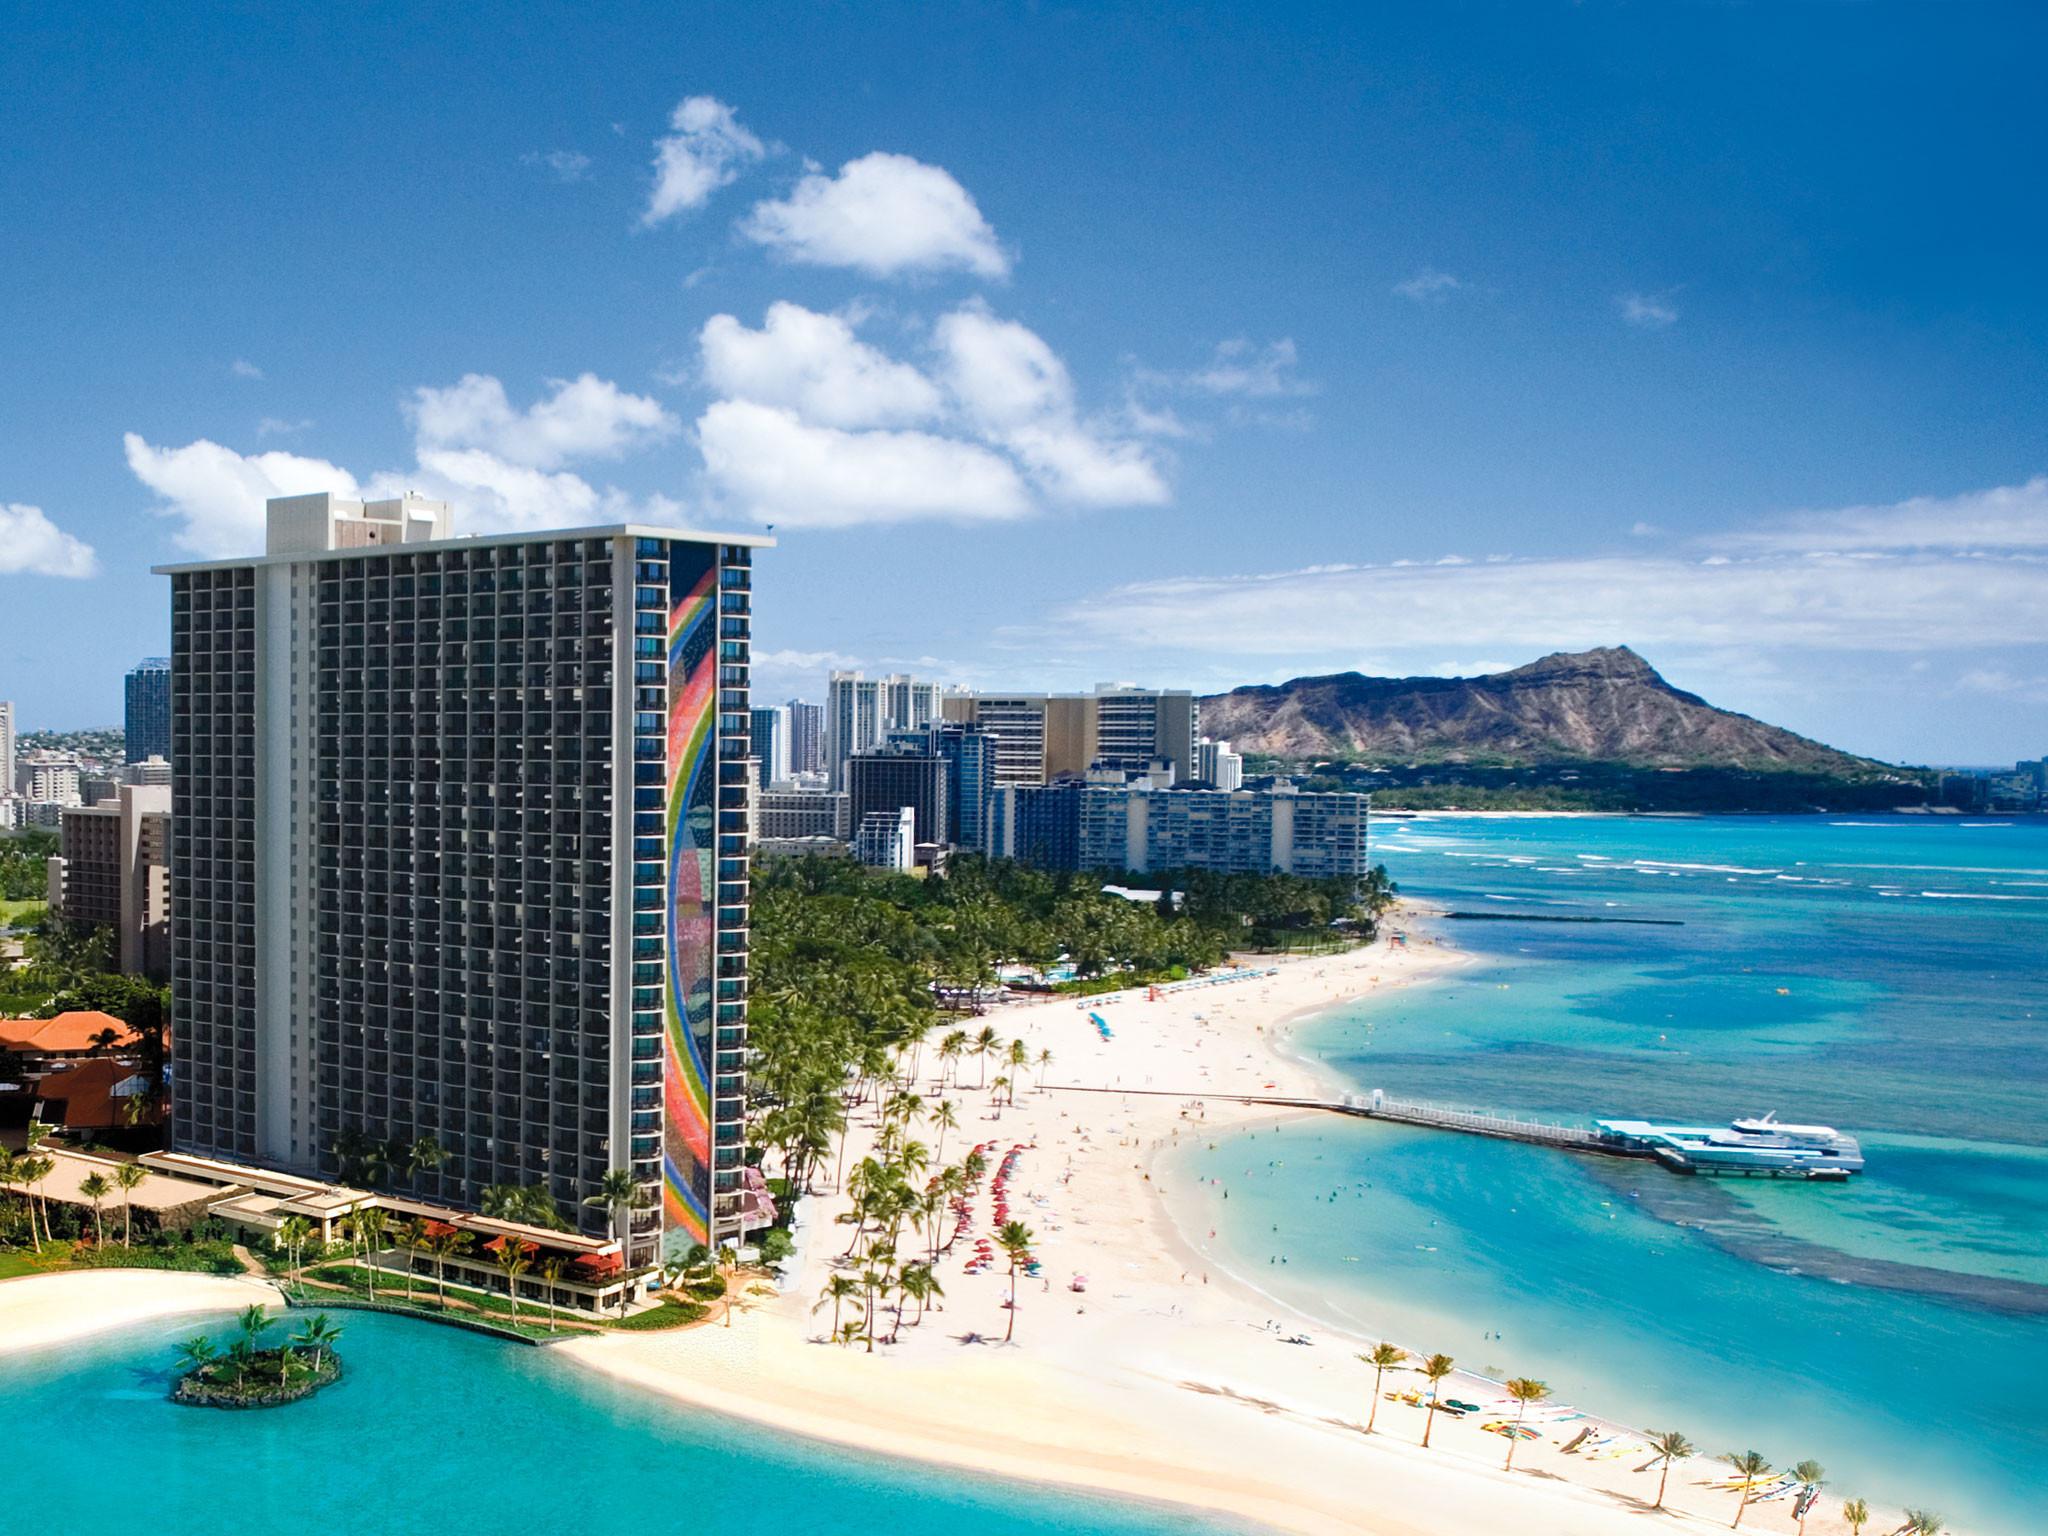 Waikiki Beach Wallpaper 60 images 2048x1536